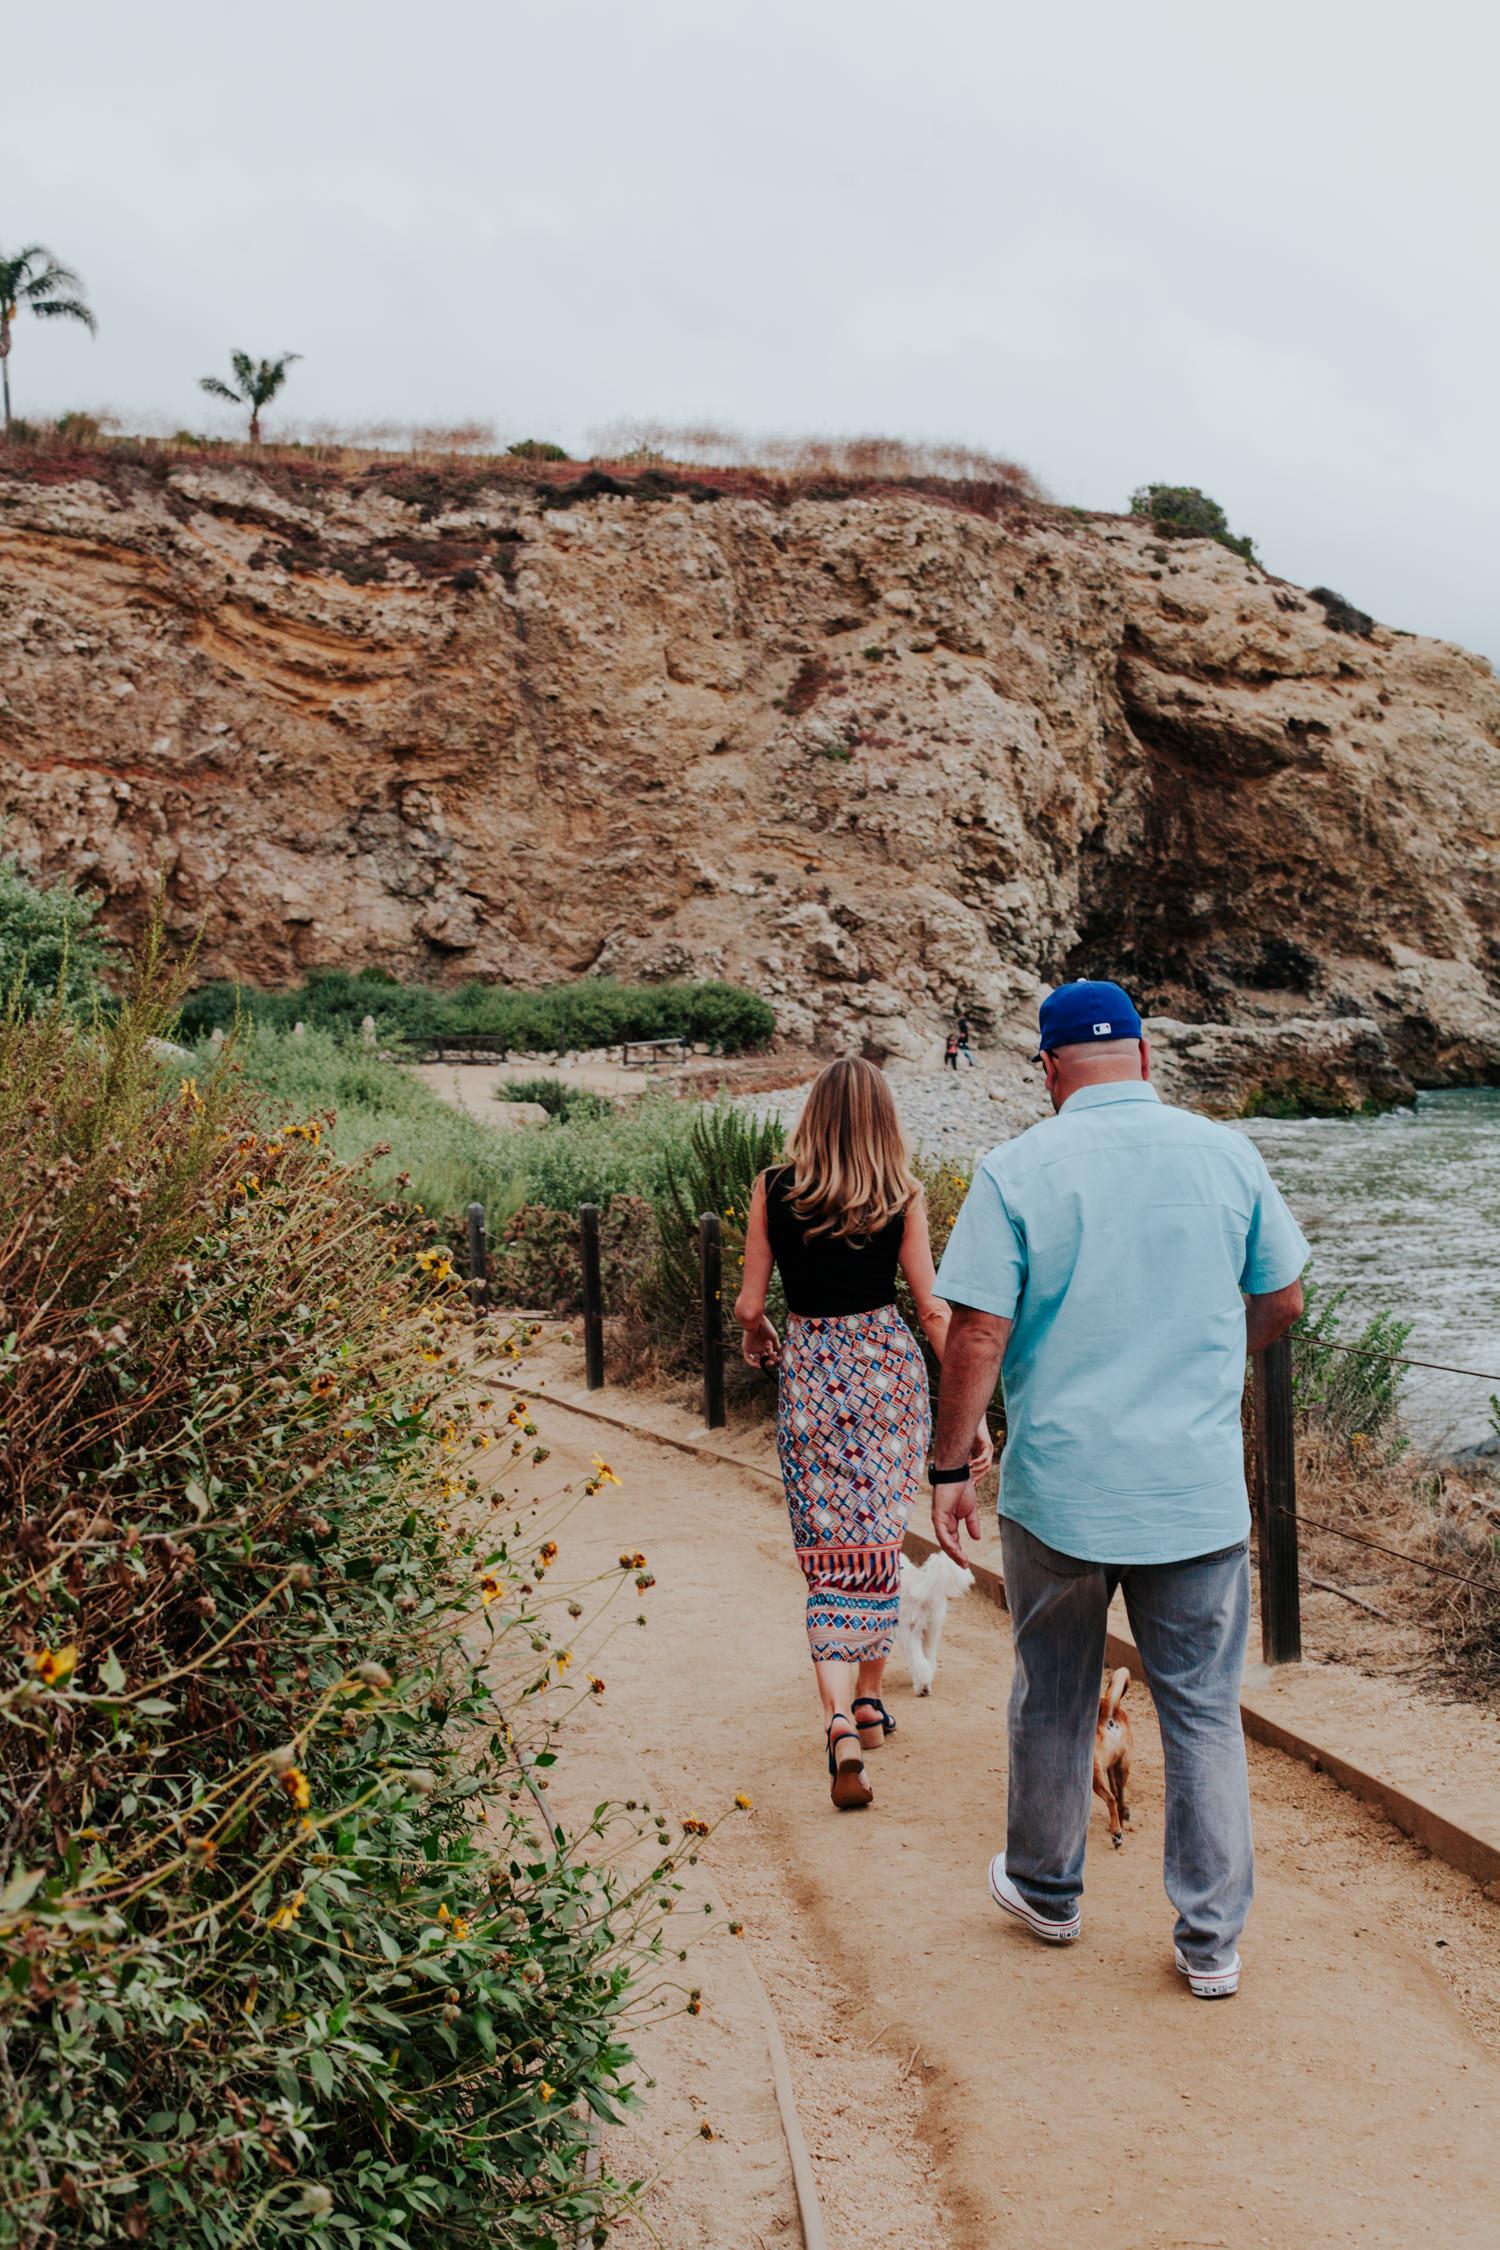 terranea-resort-palos-verdes-california-wedding-photography-cove-los-angeles-pierce-84.jpg